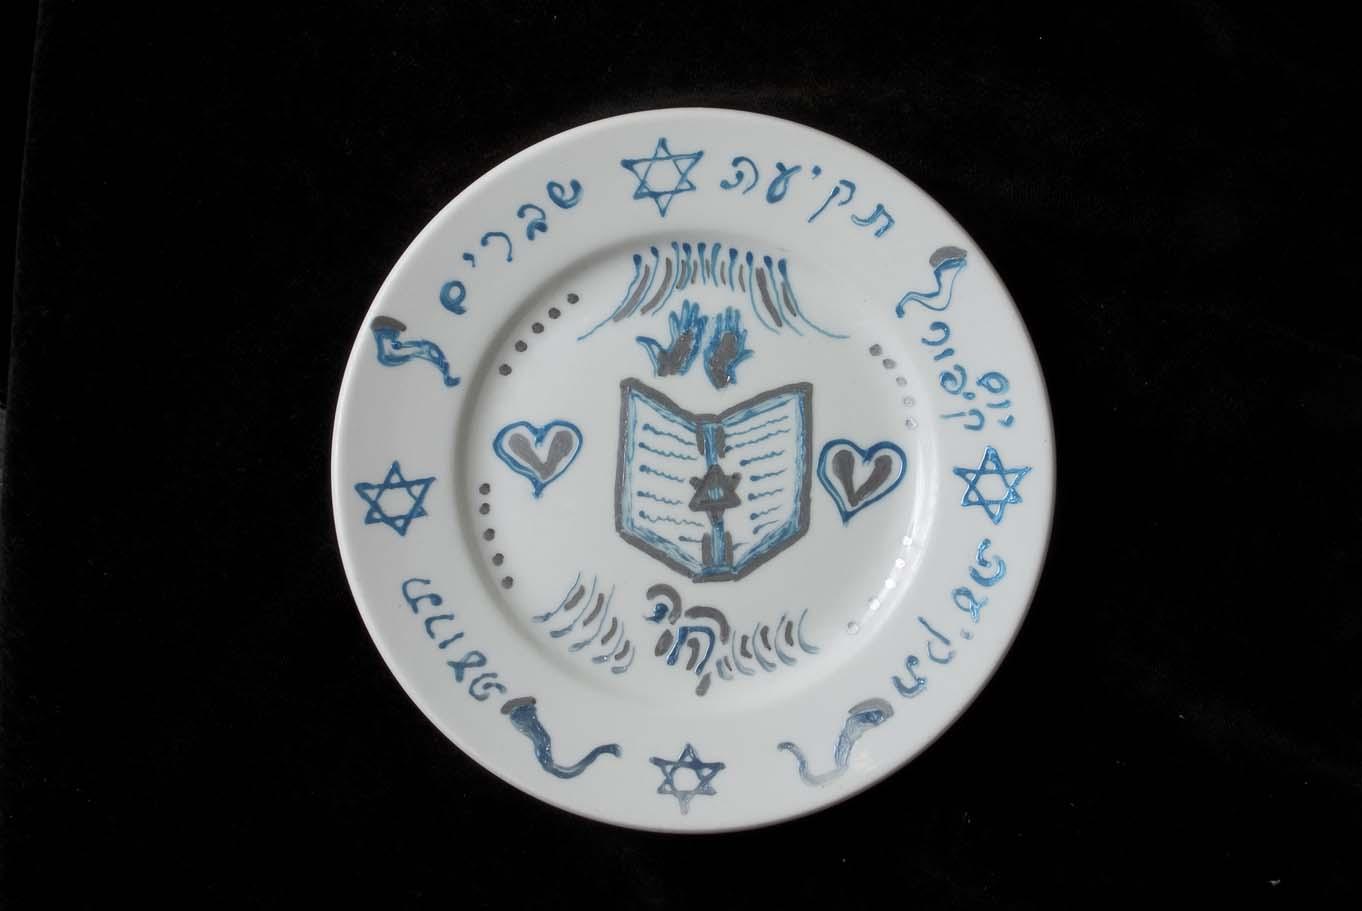 Ik vast: Torah